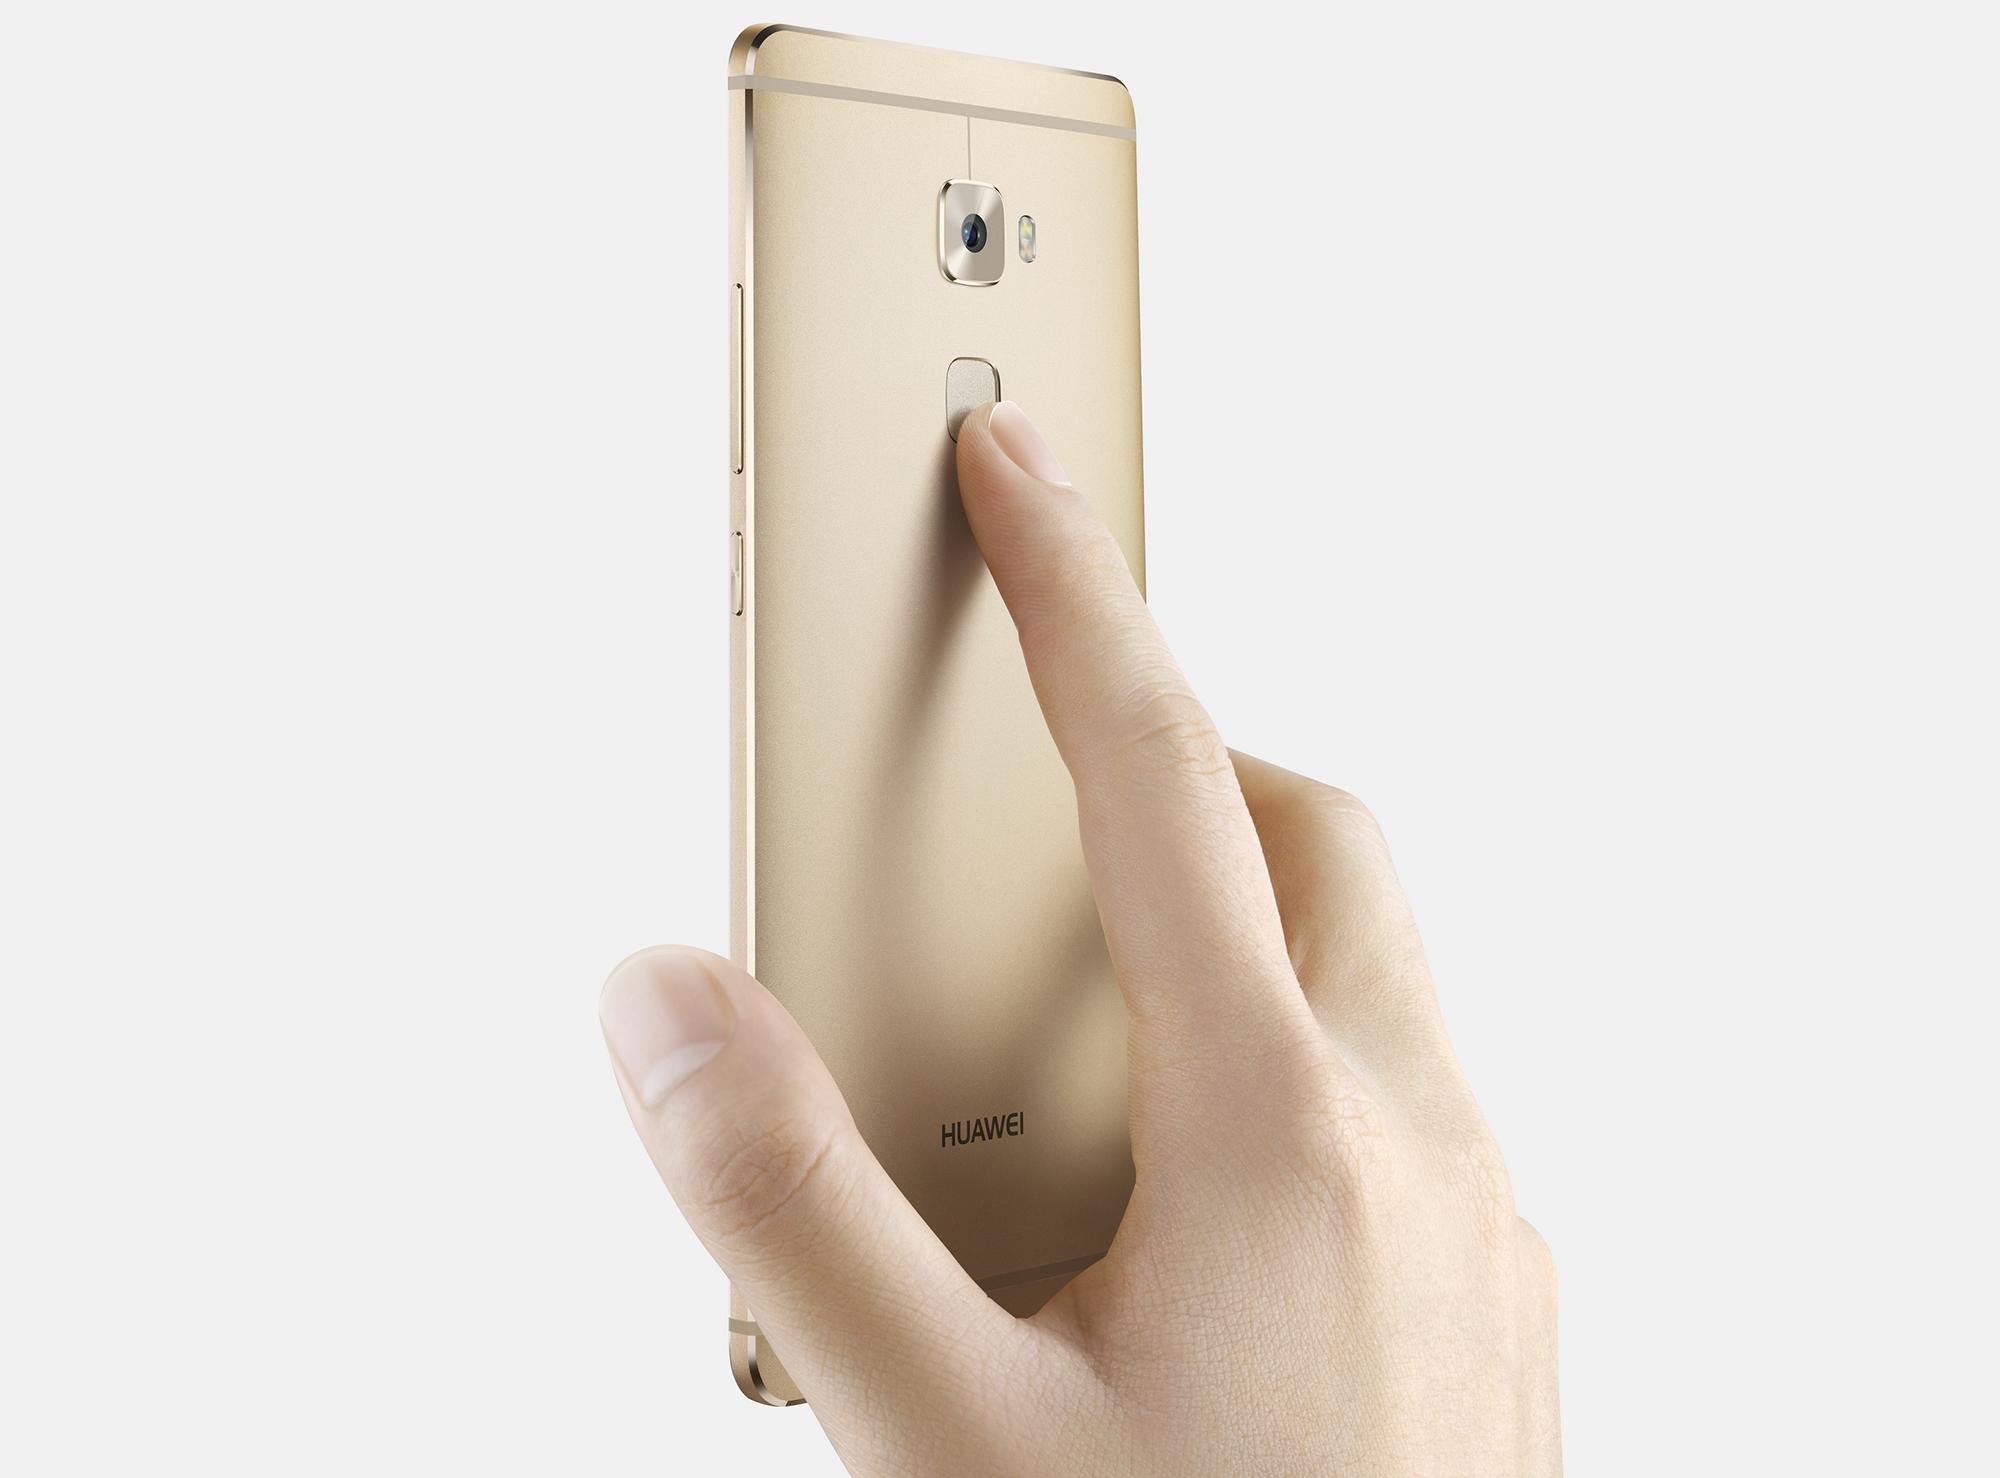 Huawei Mate S_Fingerprint